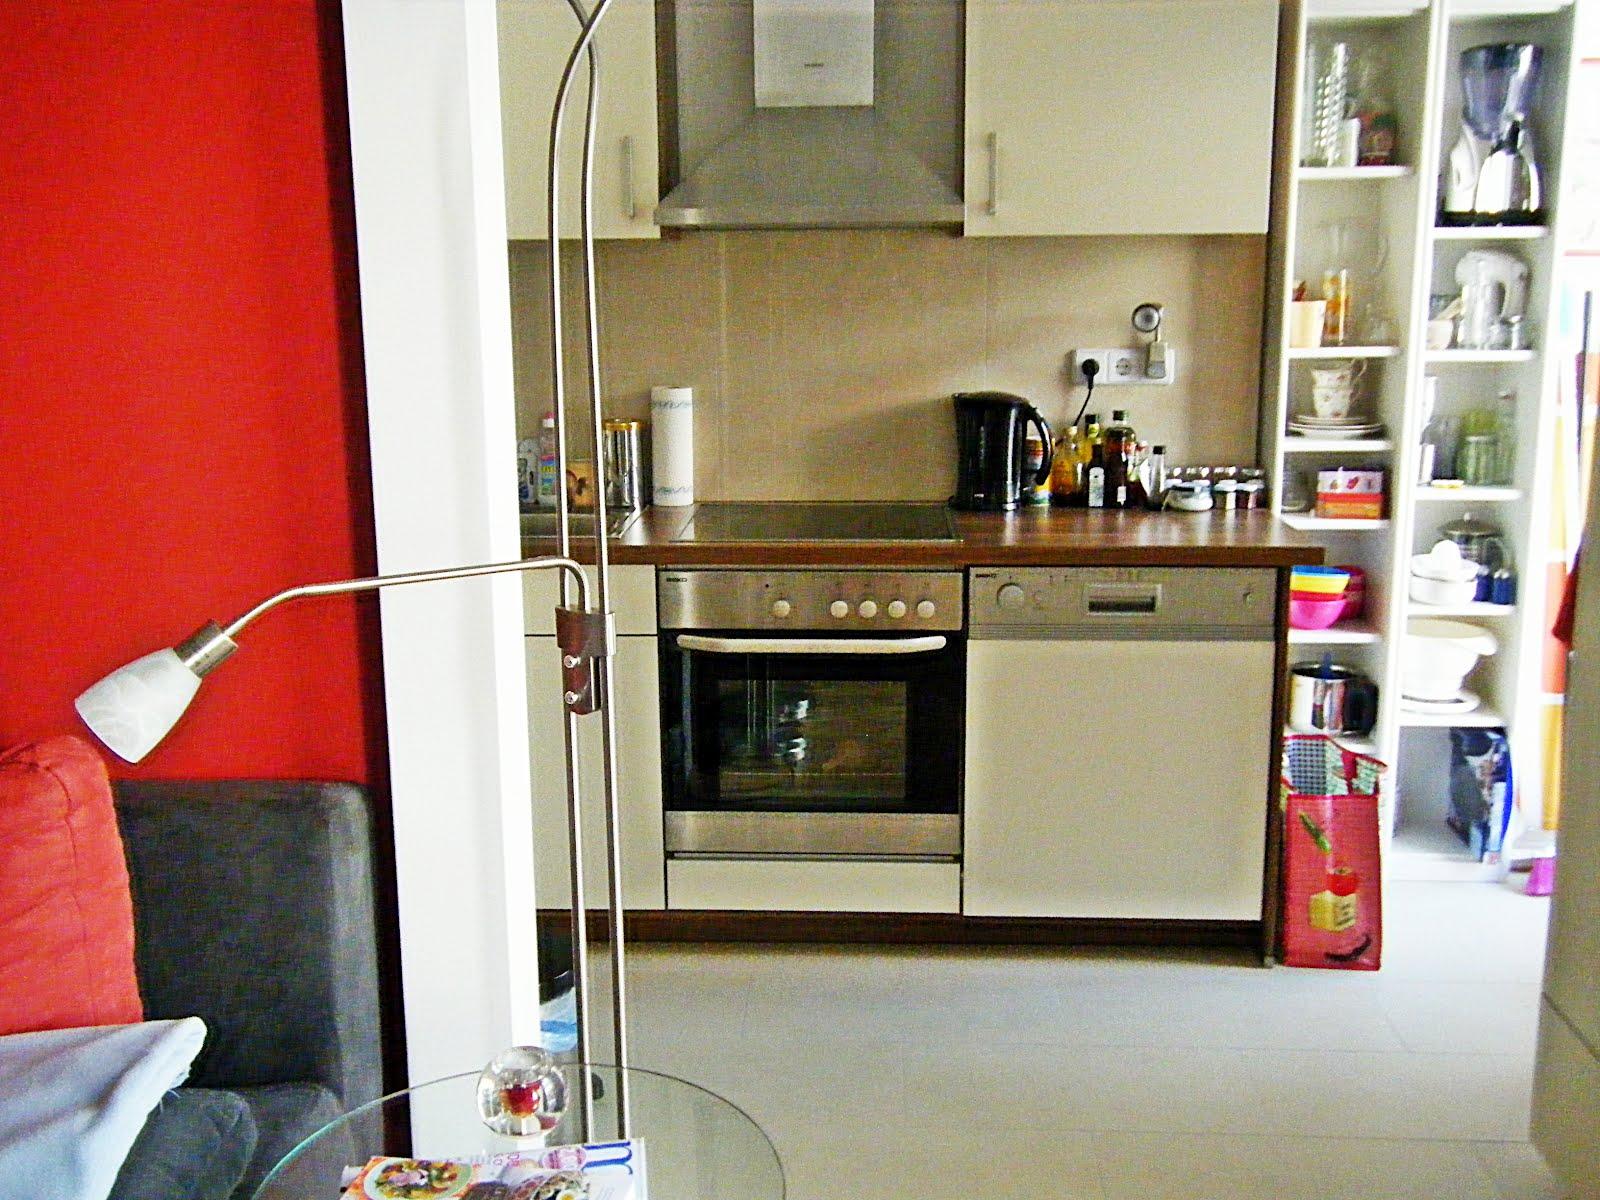 sugar and spice tag der offenen k che. Black Bedroom Furniture Sets. Home Design Ideas